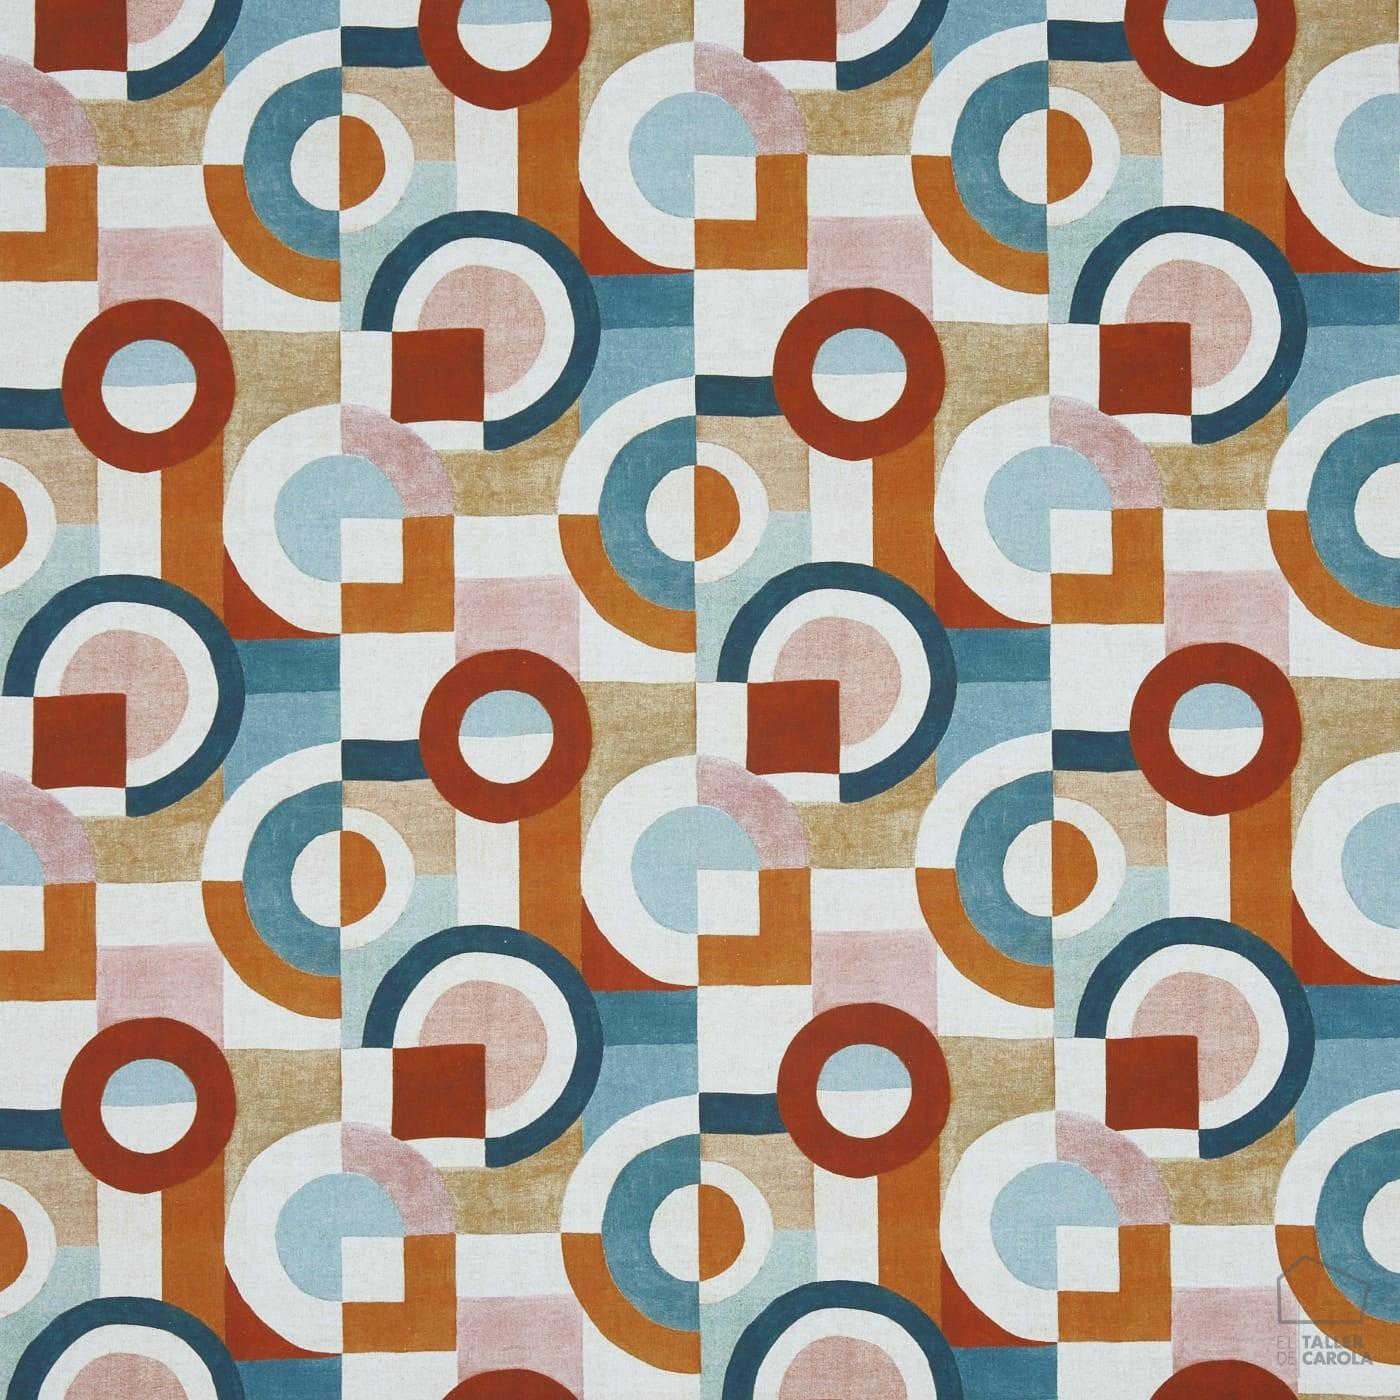 069kan-upw-pea-tela-geometrica-circulos-naranjas